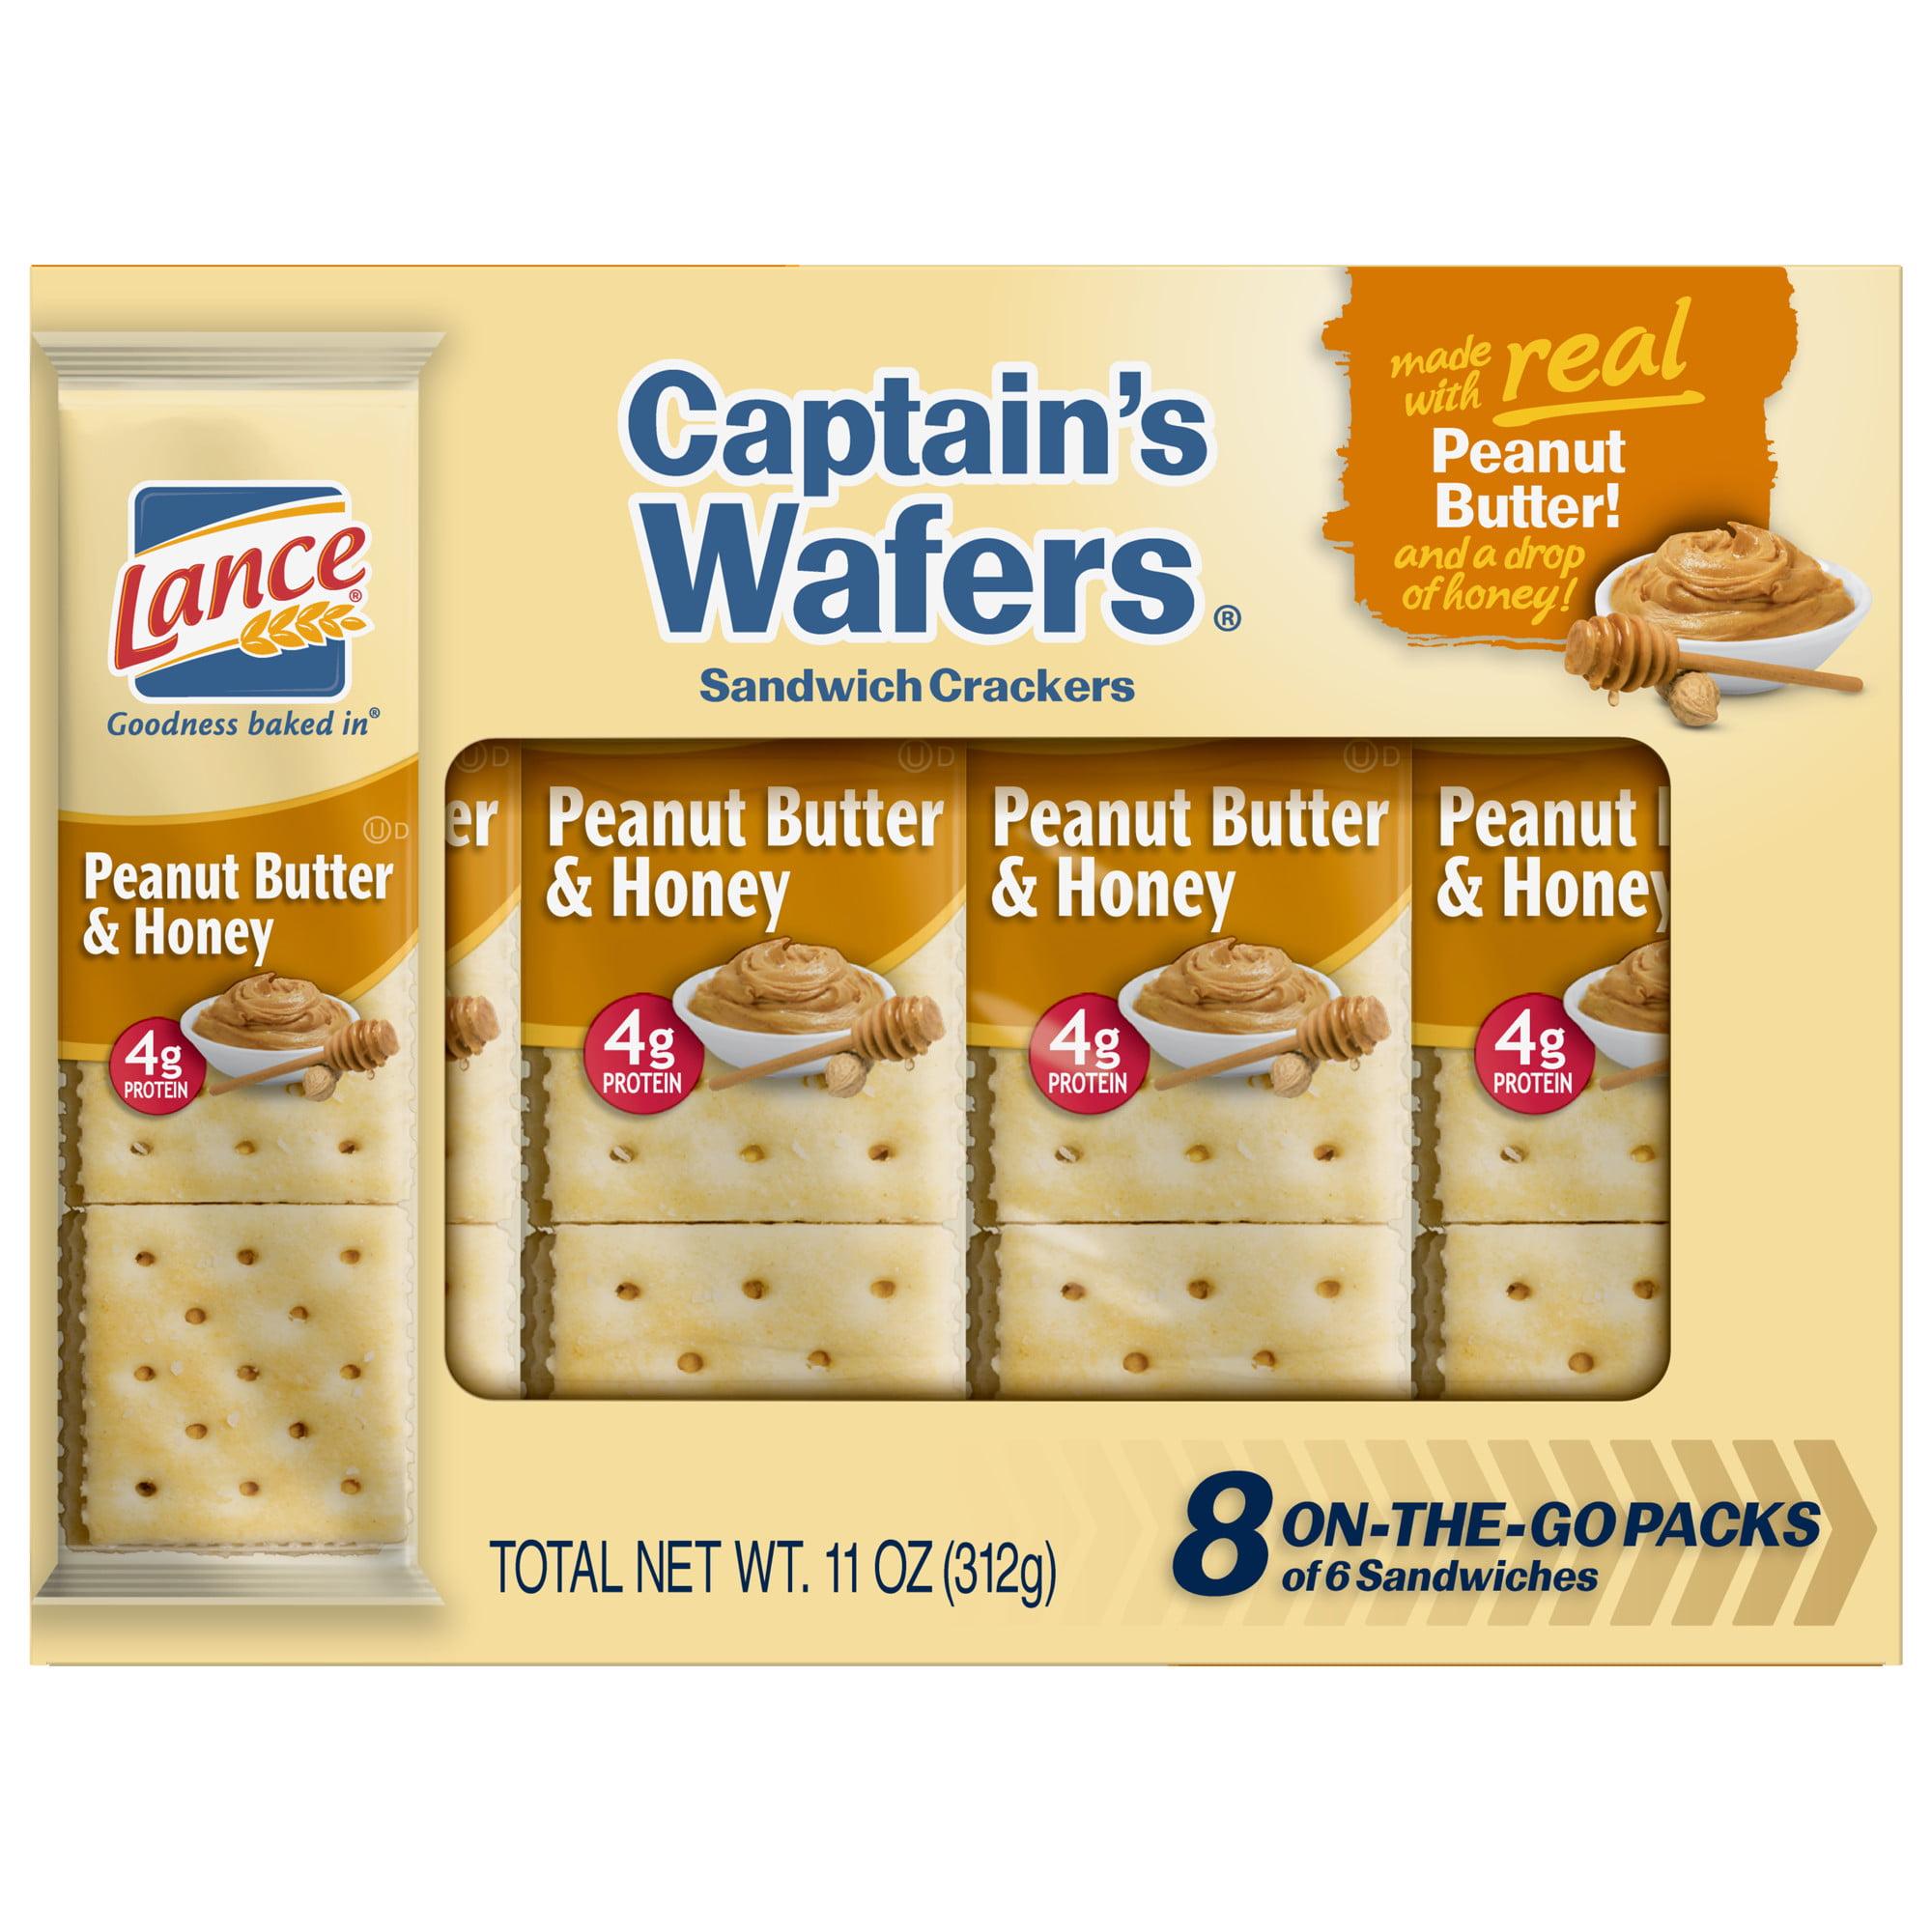 350dafec5a8 Lance Captain's Wafers Peanut Butter & Honey Sandwich Crackers, 8 Ct -  Walmart.com